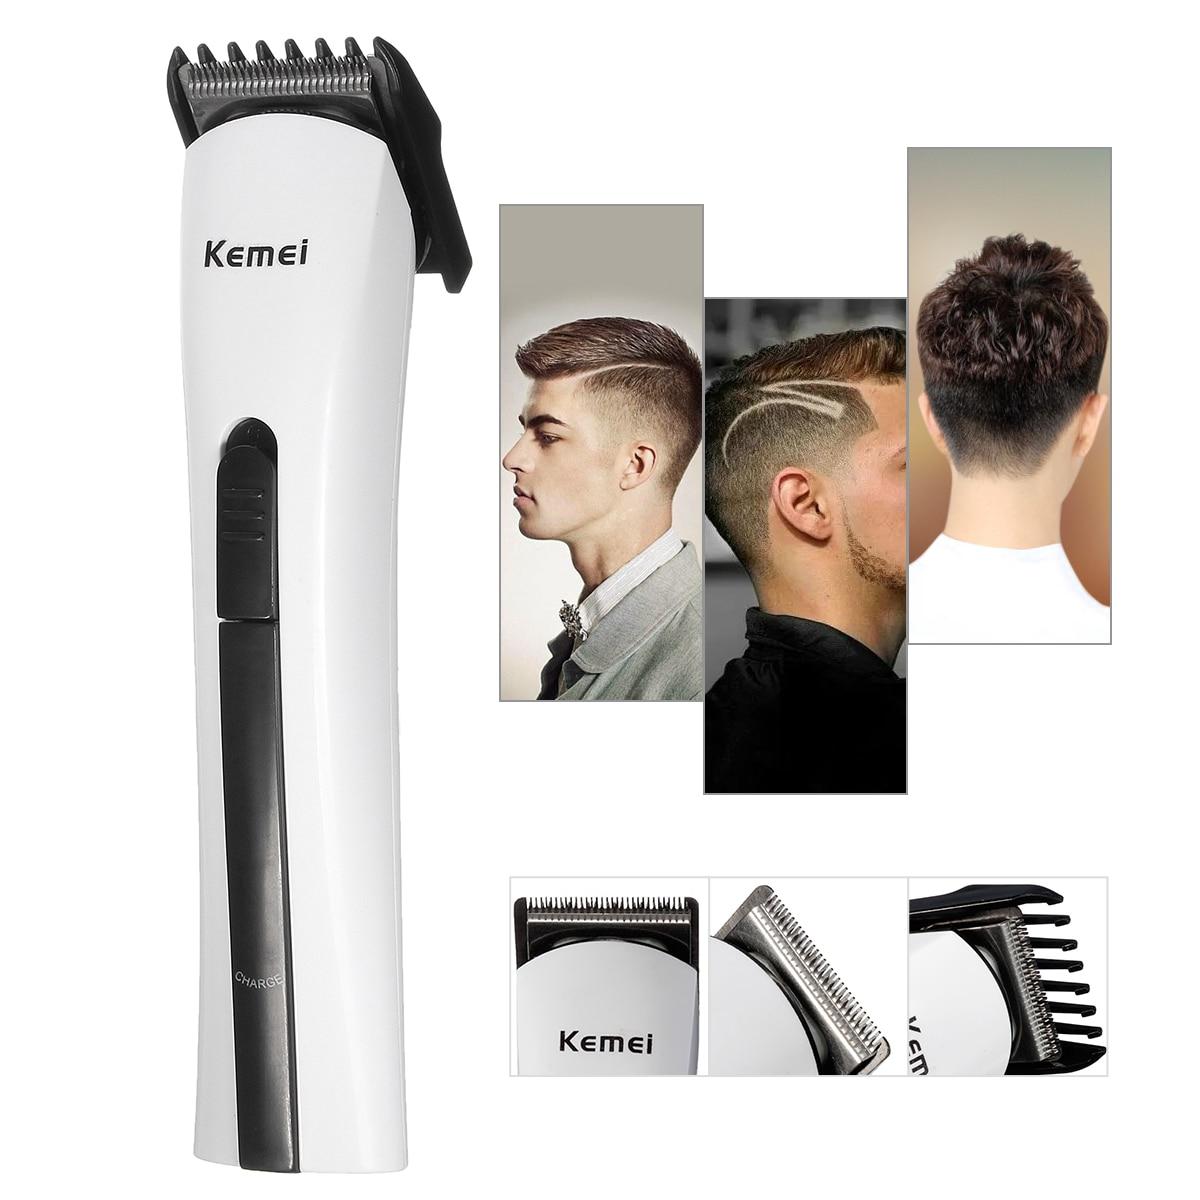 Kemei AC220-240V Hair Trimmer Professional Hair Clipper Men Cordless Rechargeable Barber Scissors Razor GT-001 Haircut Machine